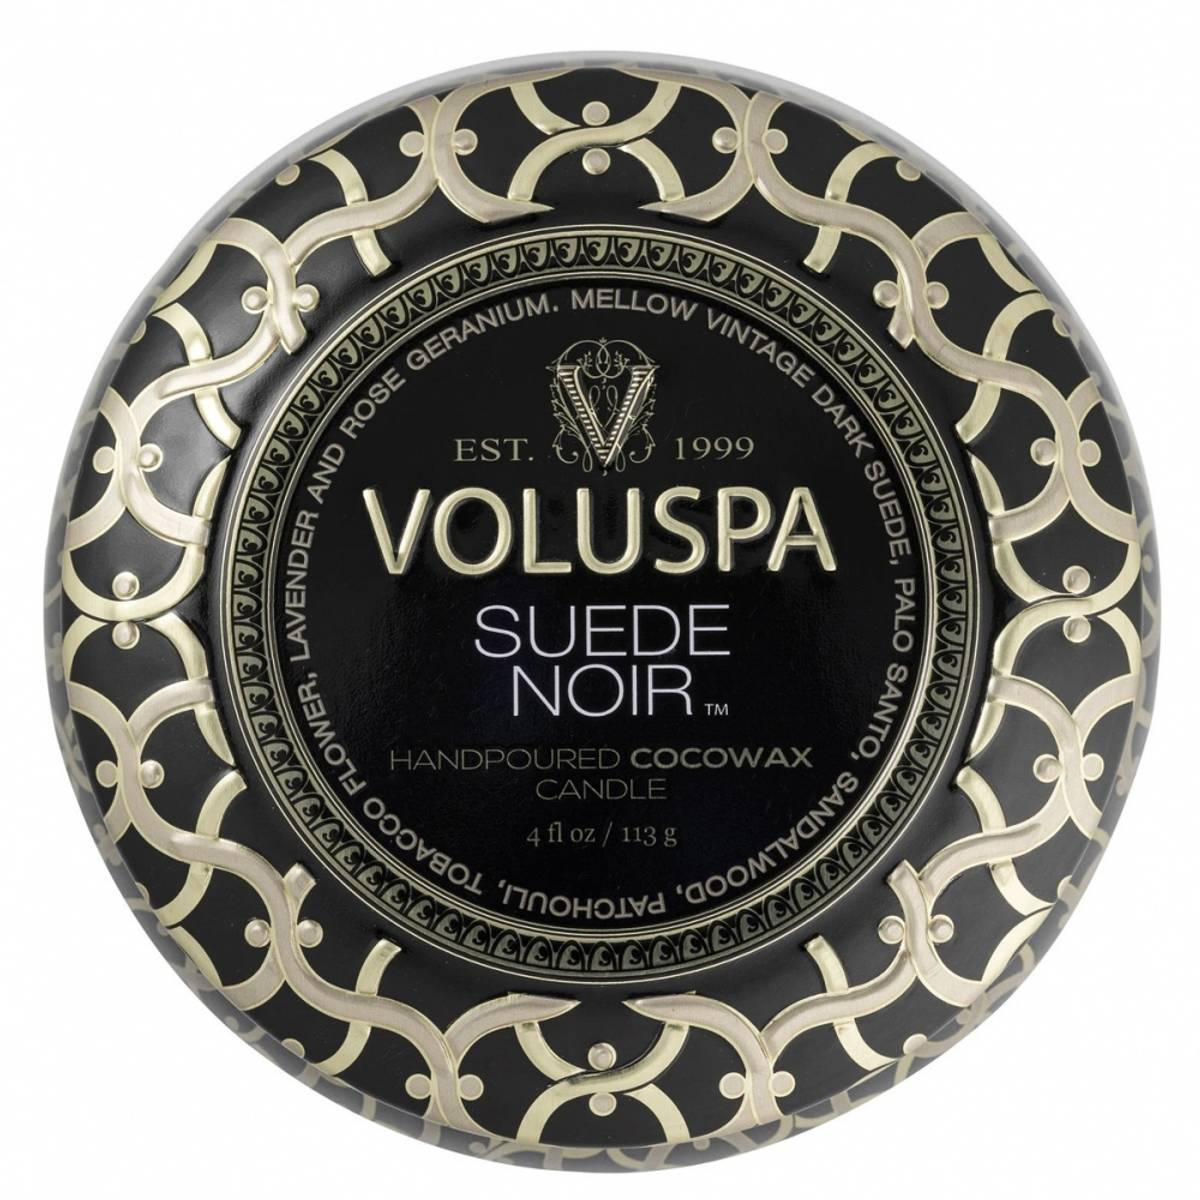 VOLUSPA SUEDE NOIR 25T